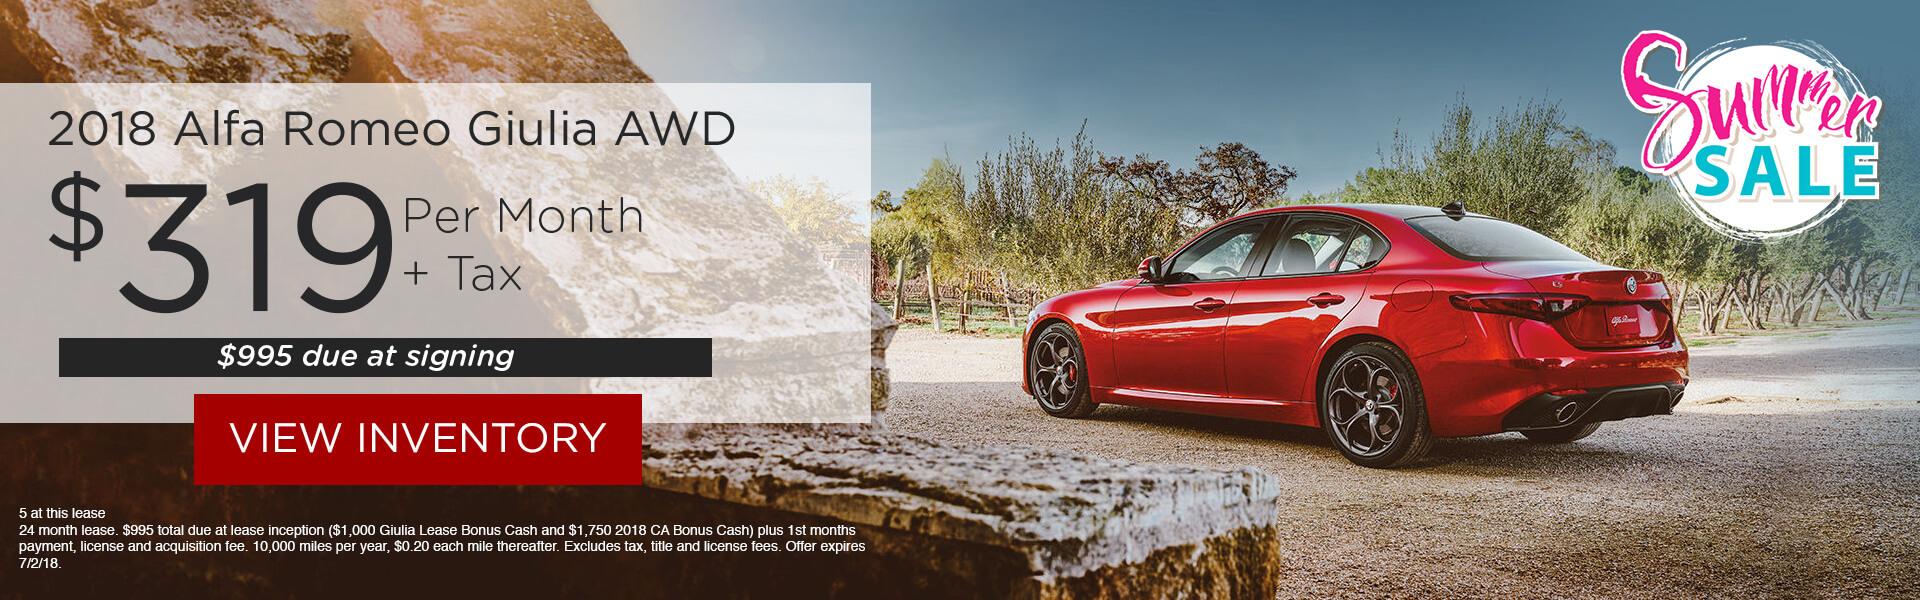 Alfa Romeo 2018 Giulia RWD